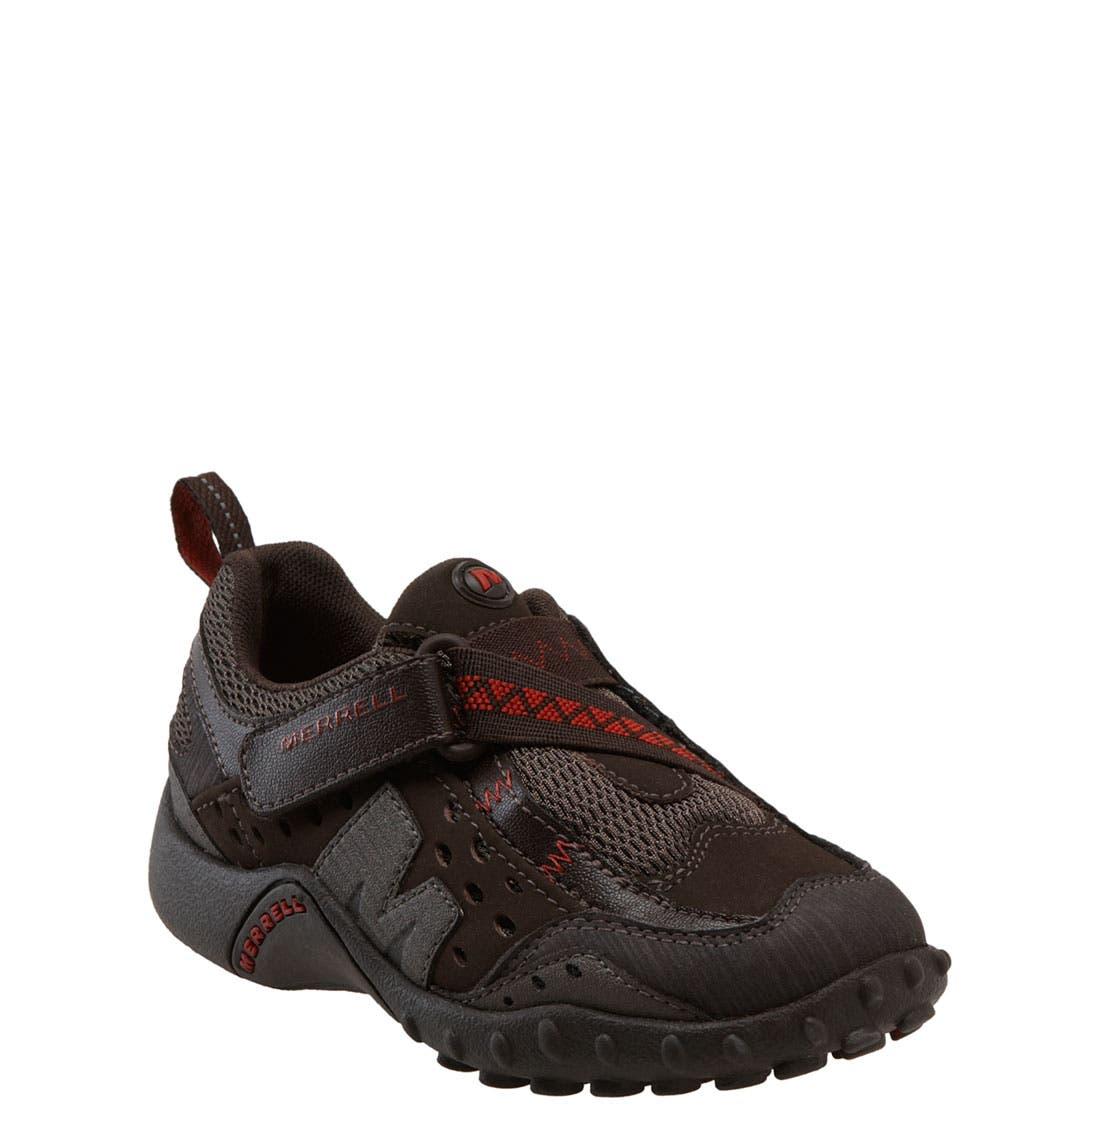 Main Image - Merrell 'Intercept' Athletic Shoe (Toddler, Little Kid & Big Kid)